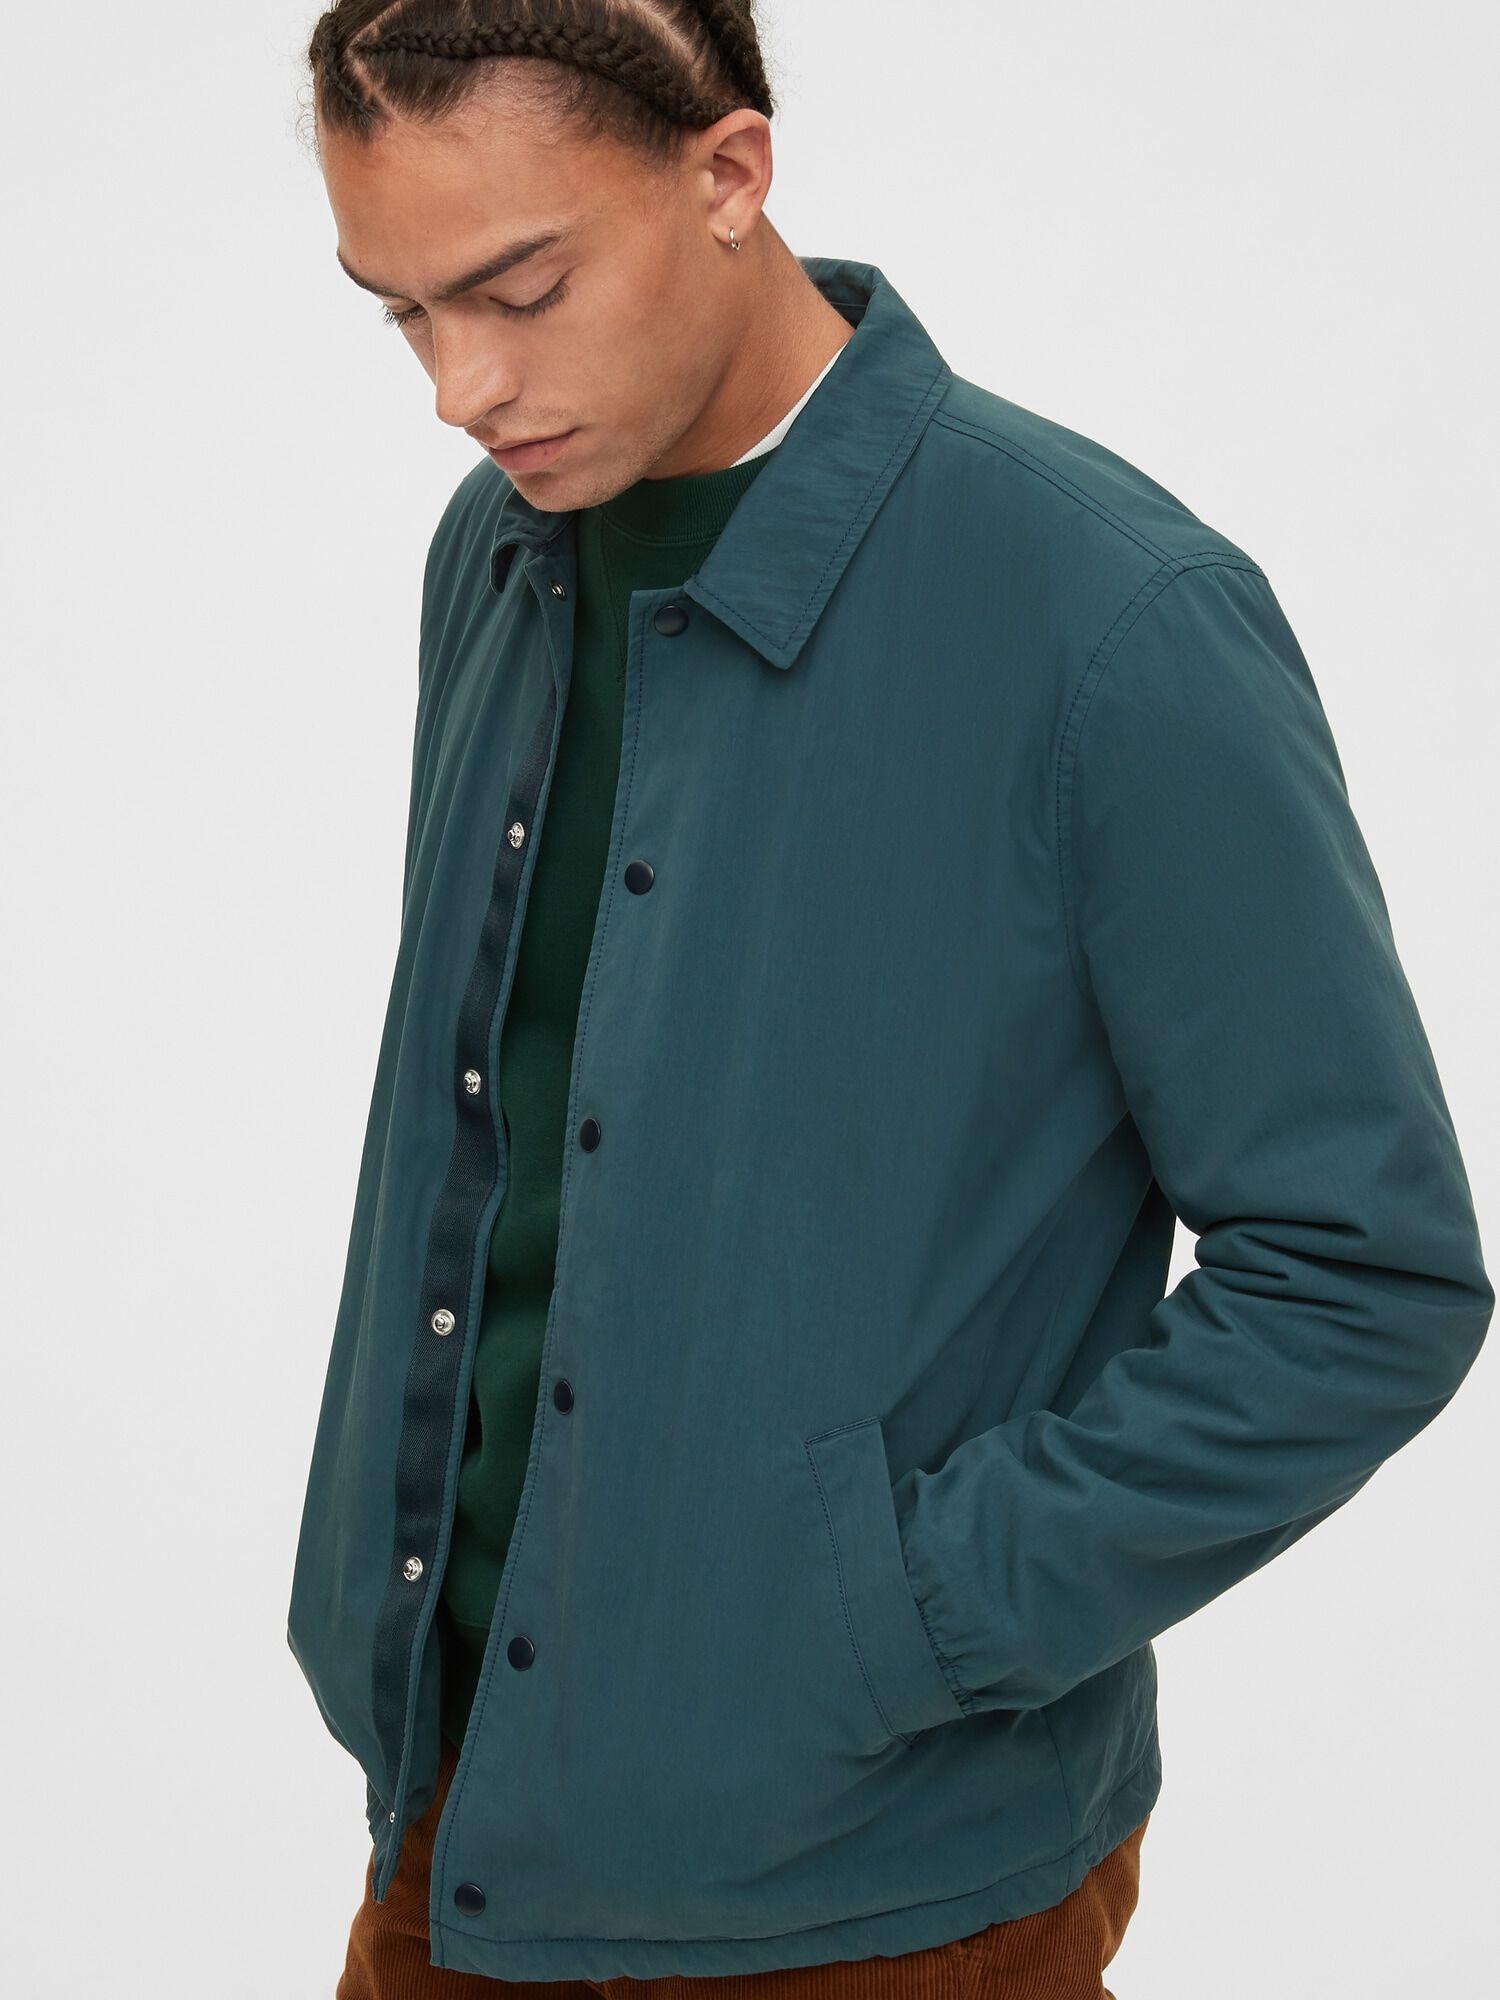 a man wearing a teal coach jacket